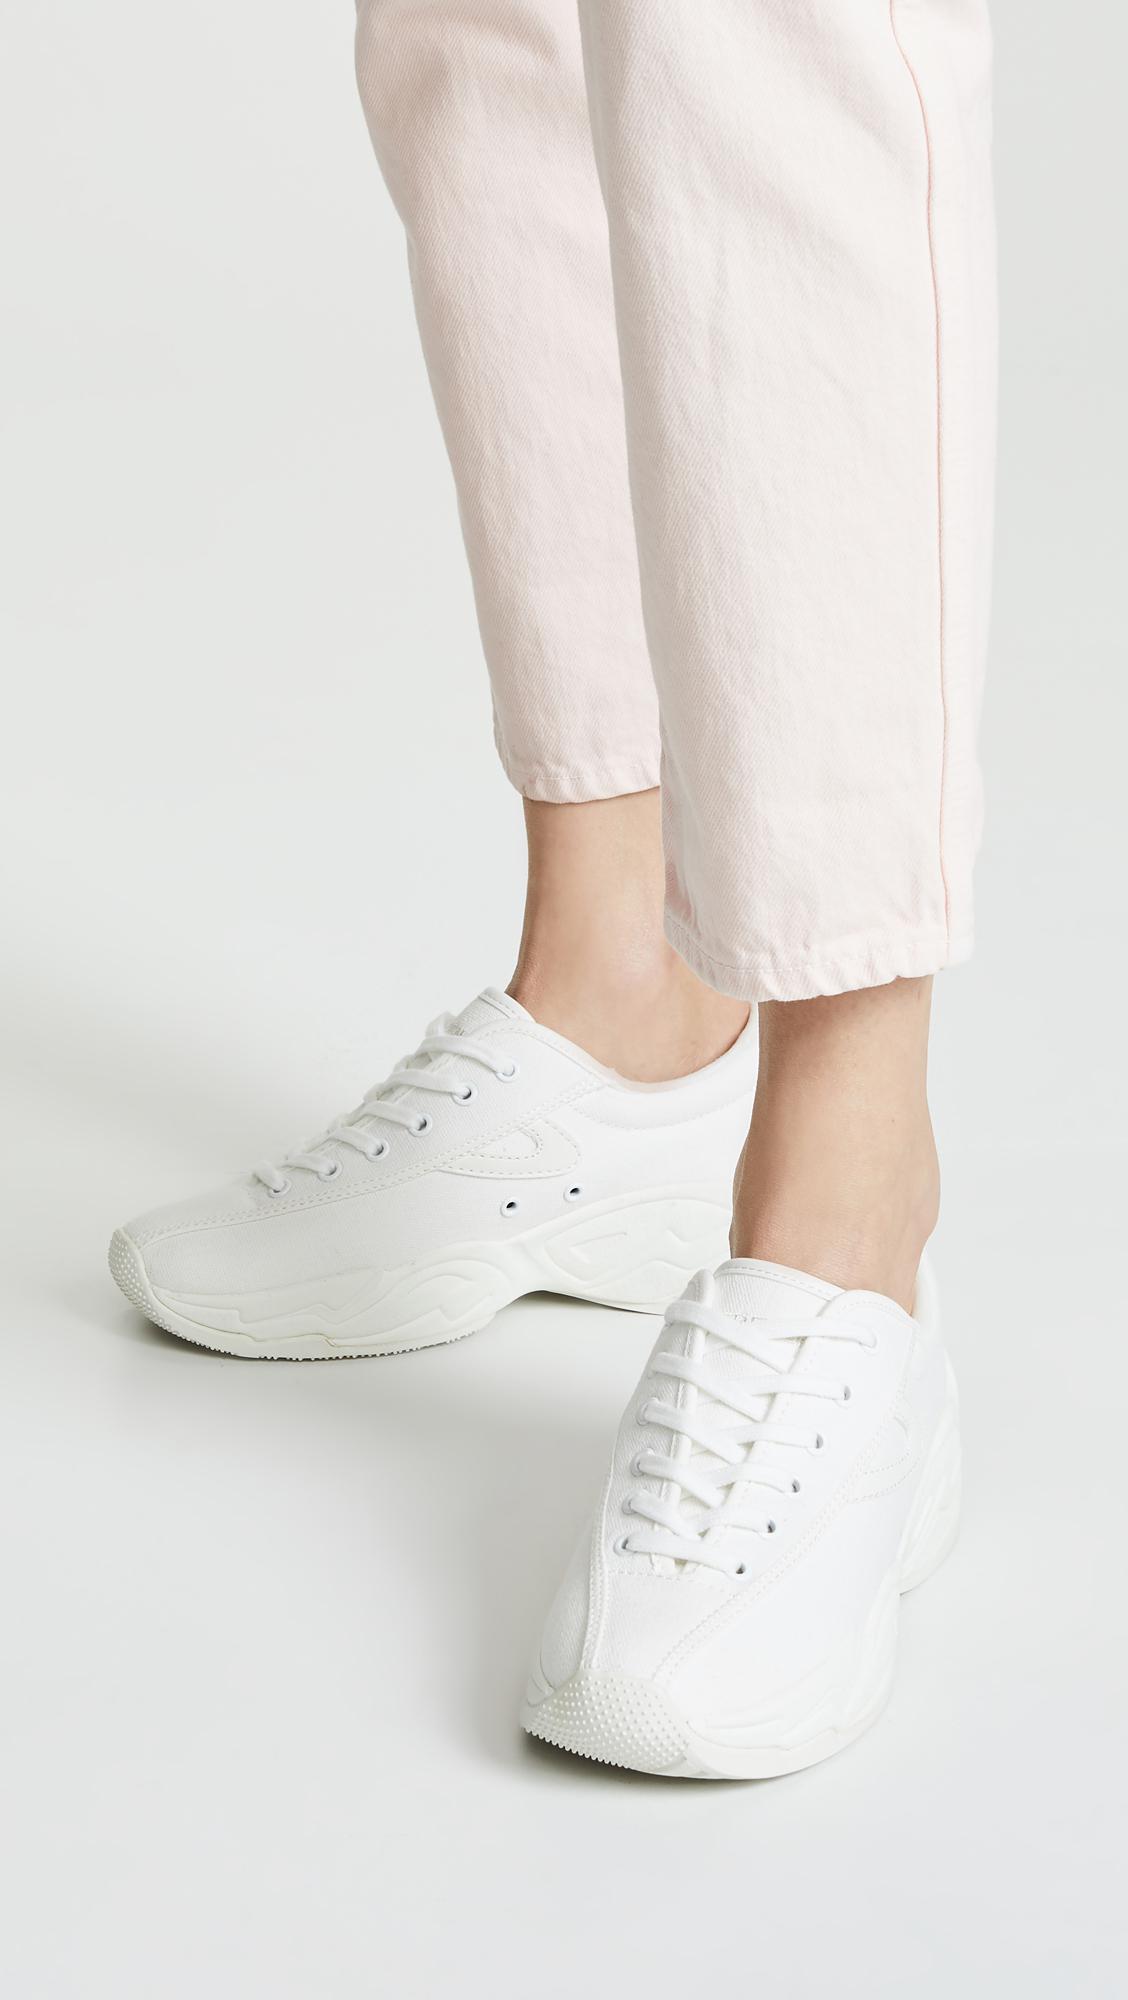 c1319e94d34f Tretorn - White Nylite Fly Sneakers - Lyst. View fullscreen